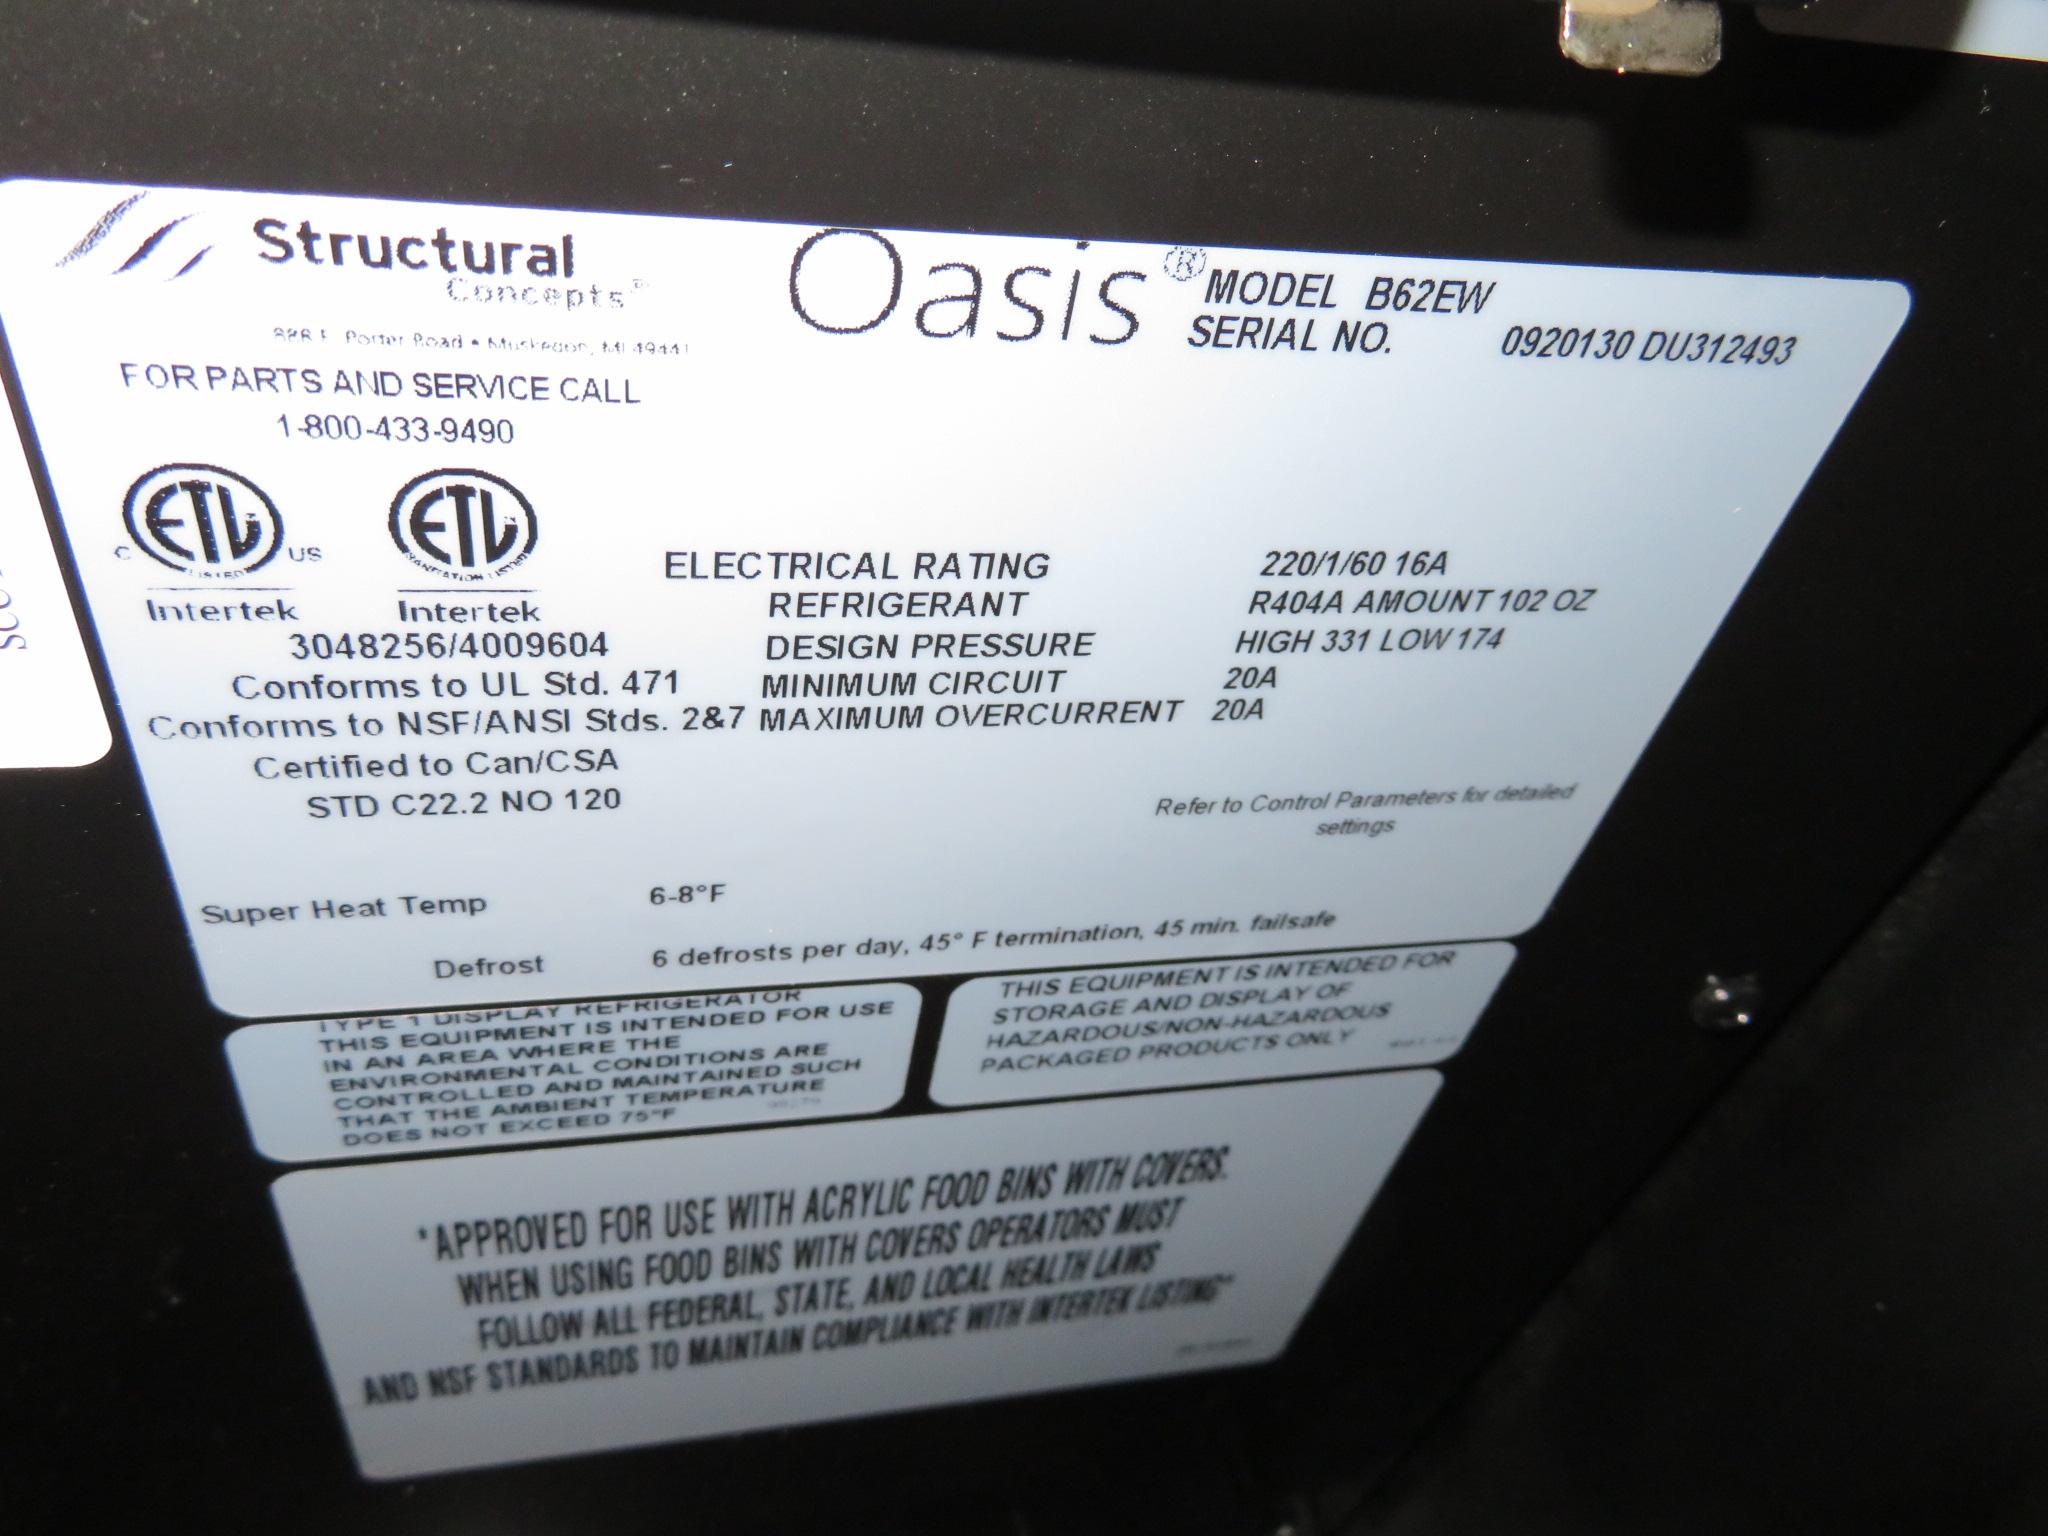 "Lot 63 - Structural Oasis # B62EW 72"" Self Service S.C Illum Case"